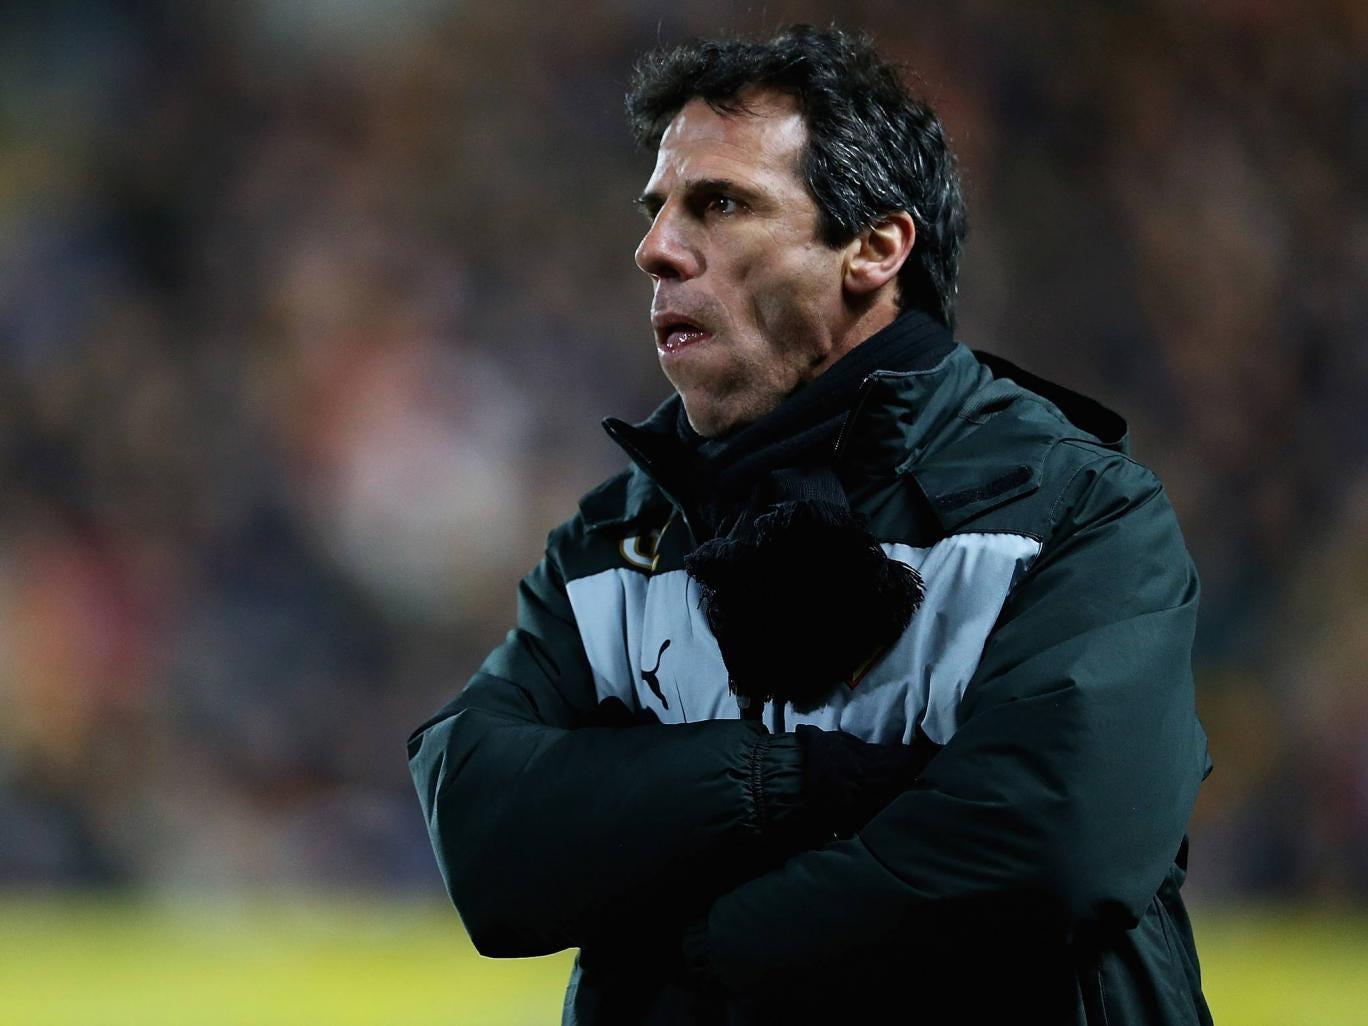 Watford manager Gianfranco Zola